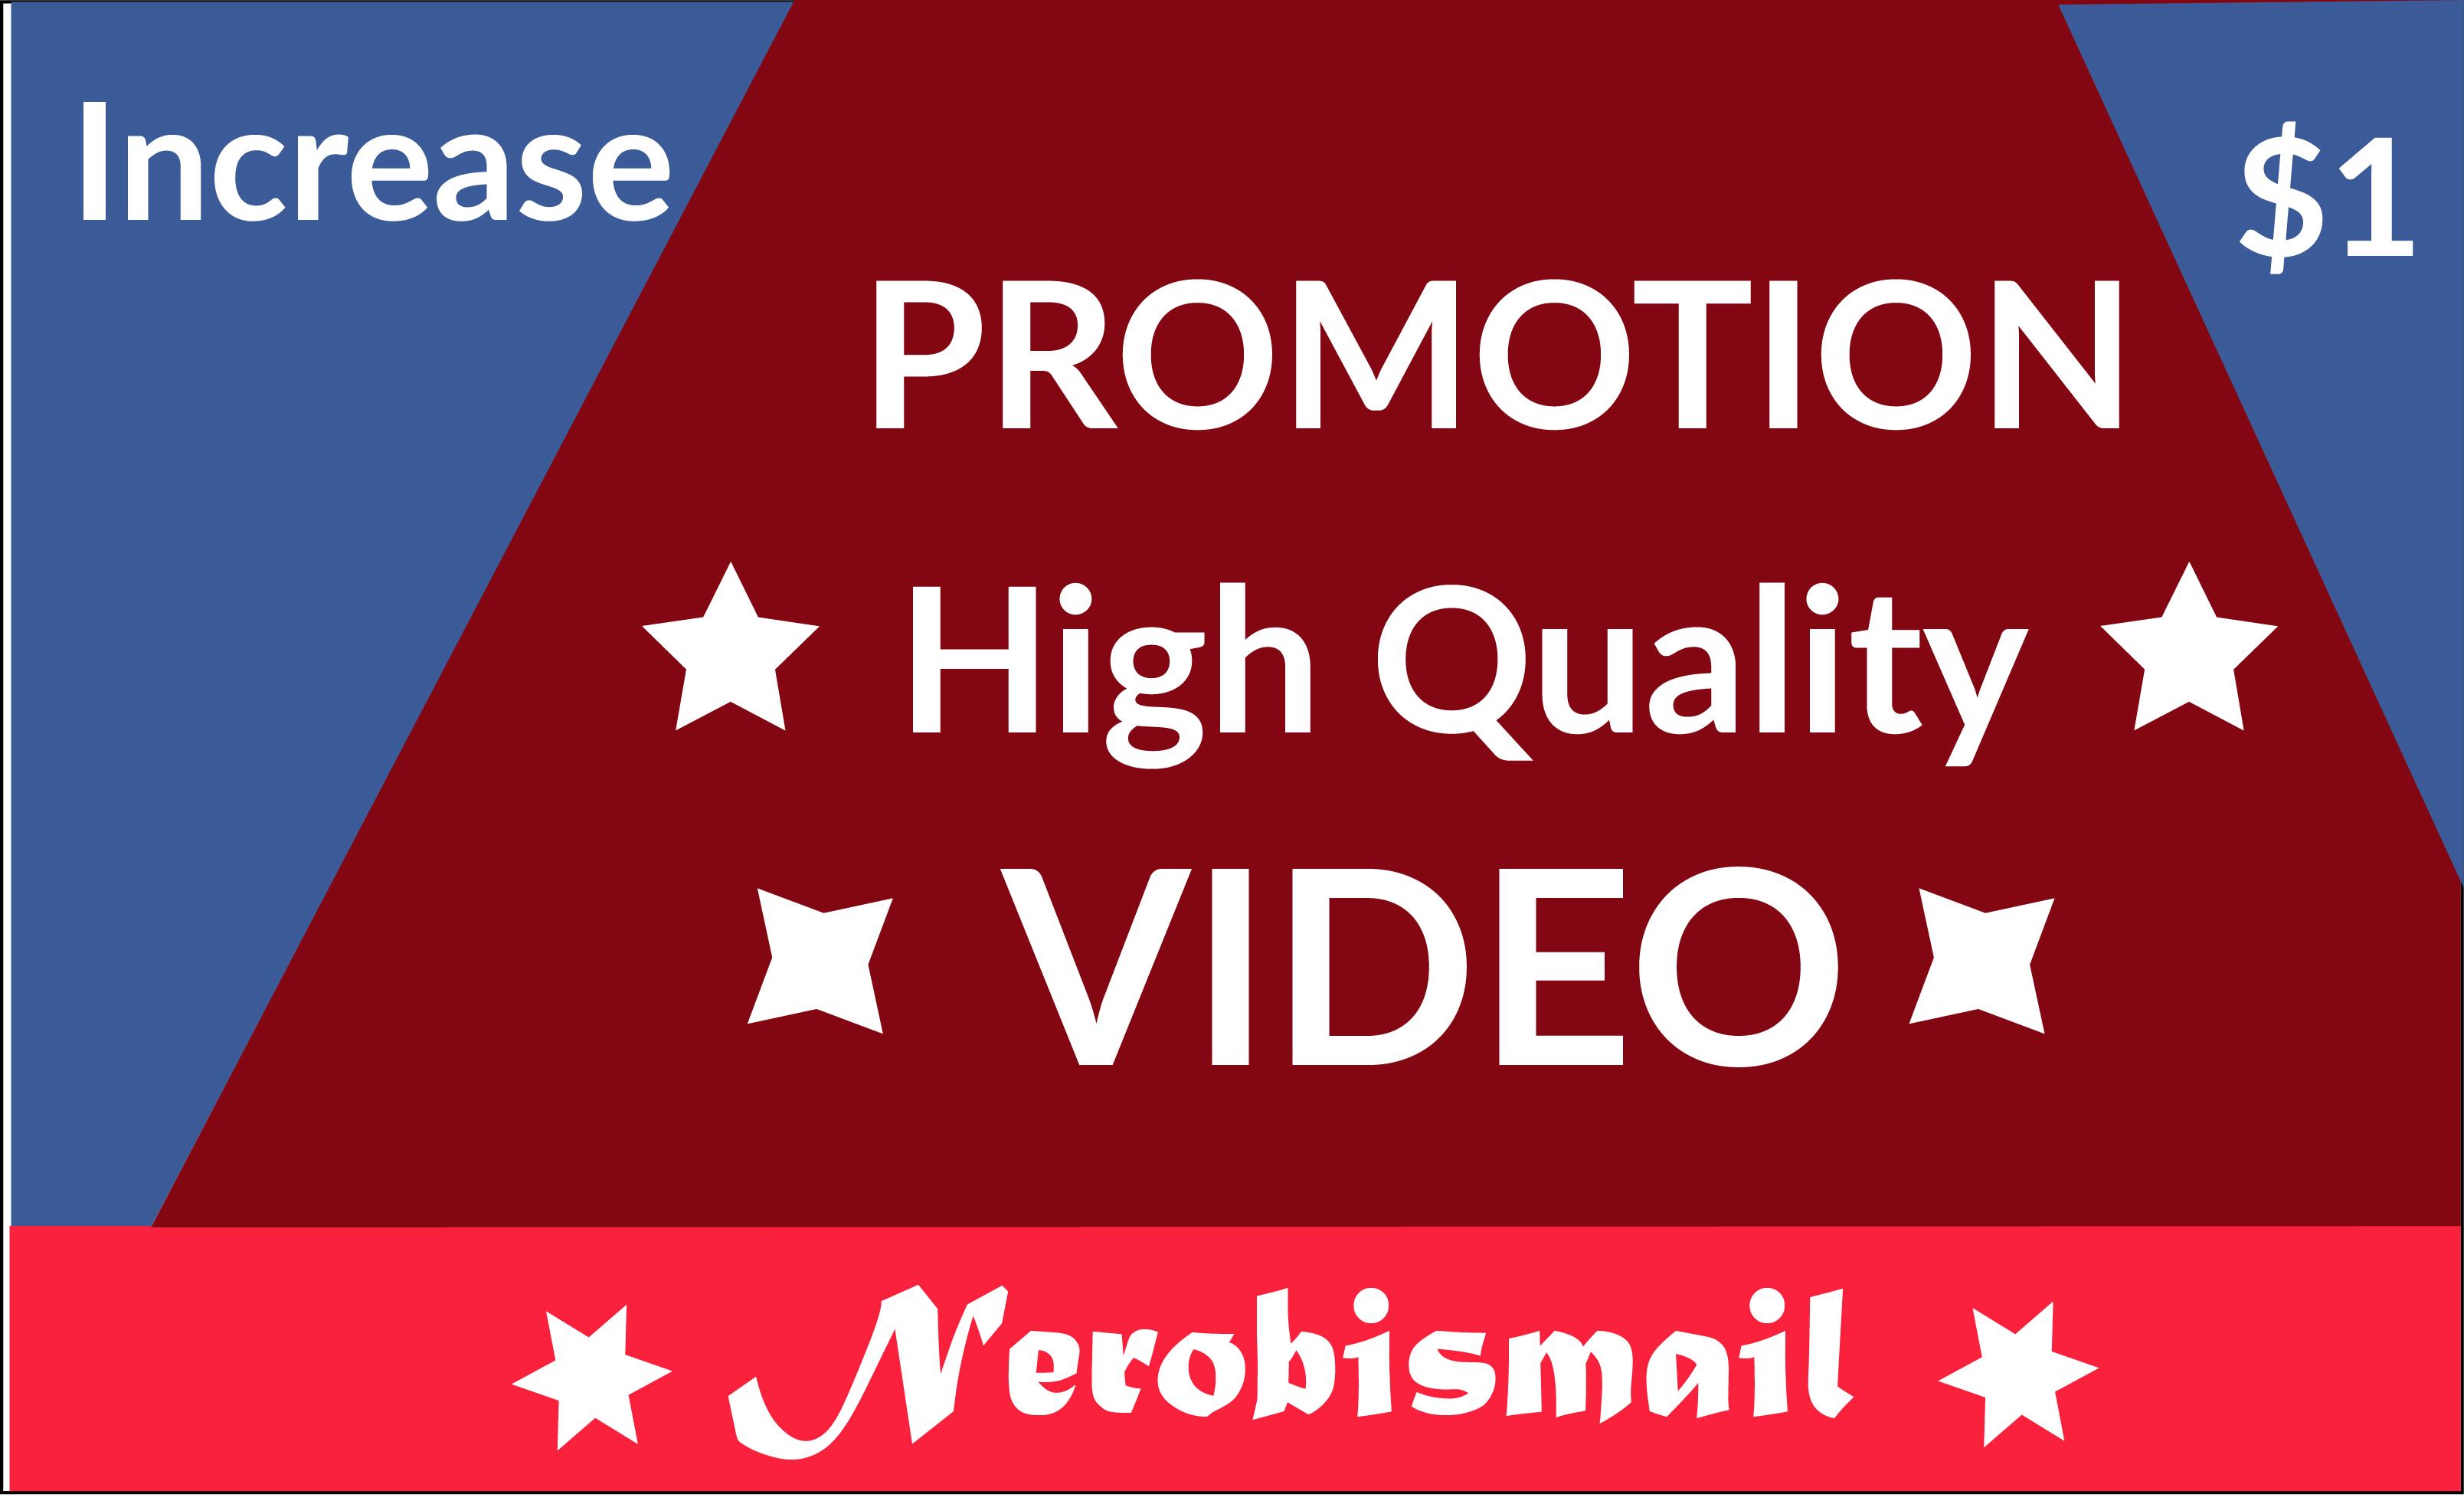 Increase HQ profile promotion video social media world user